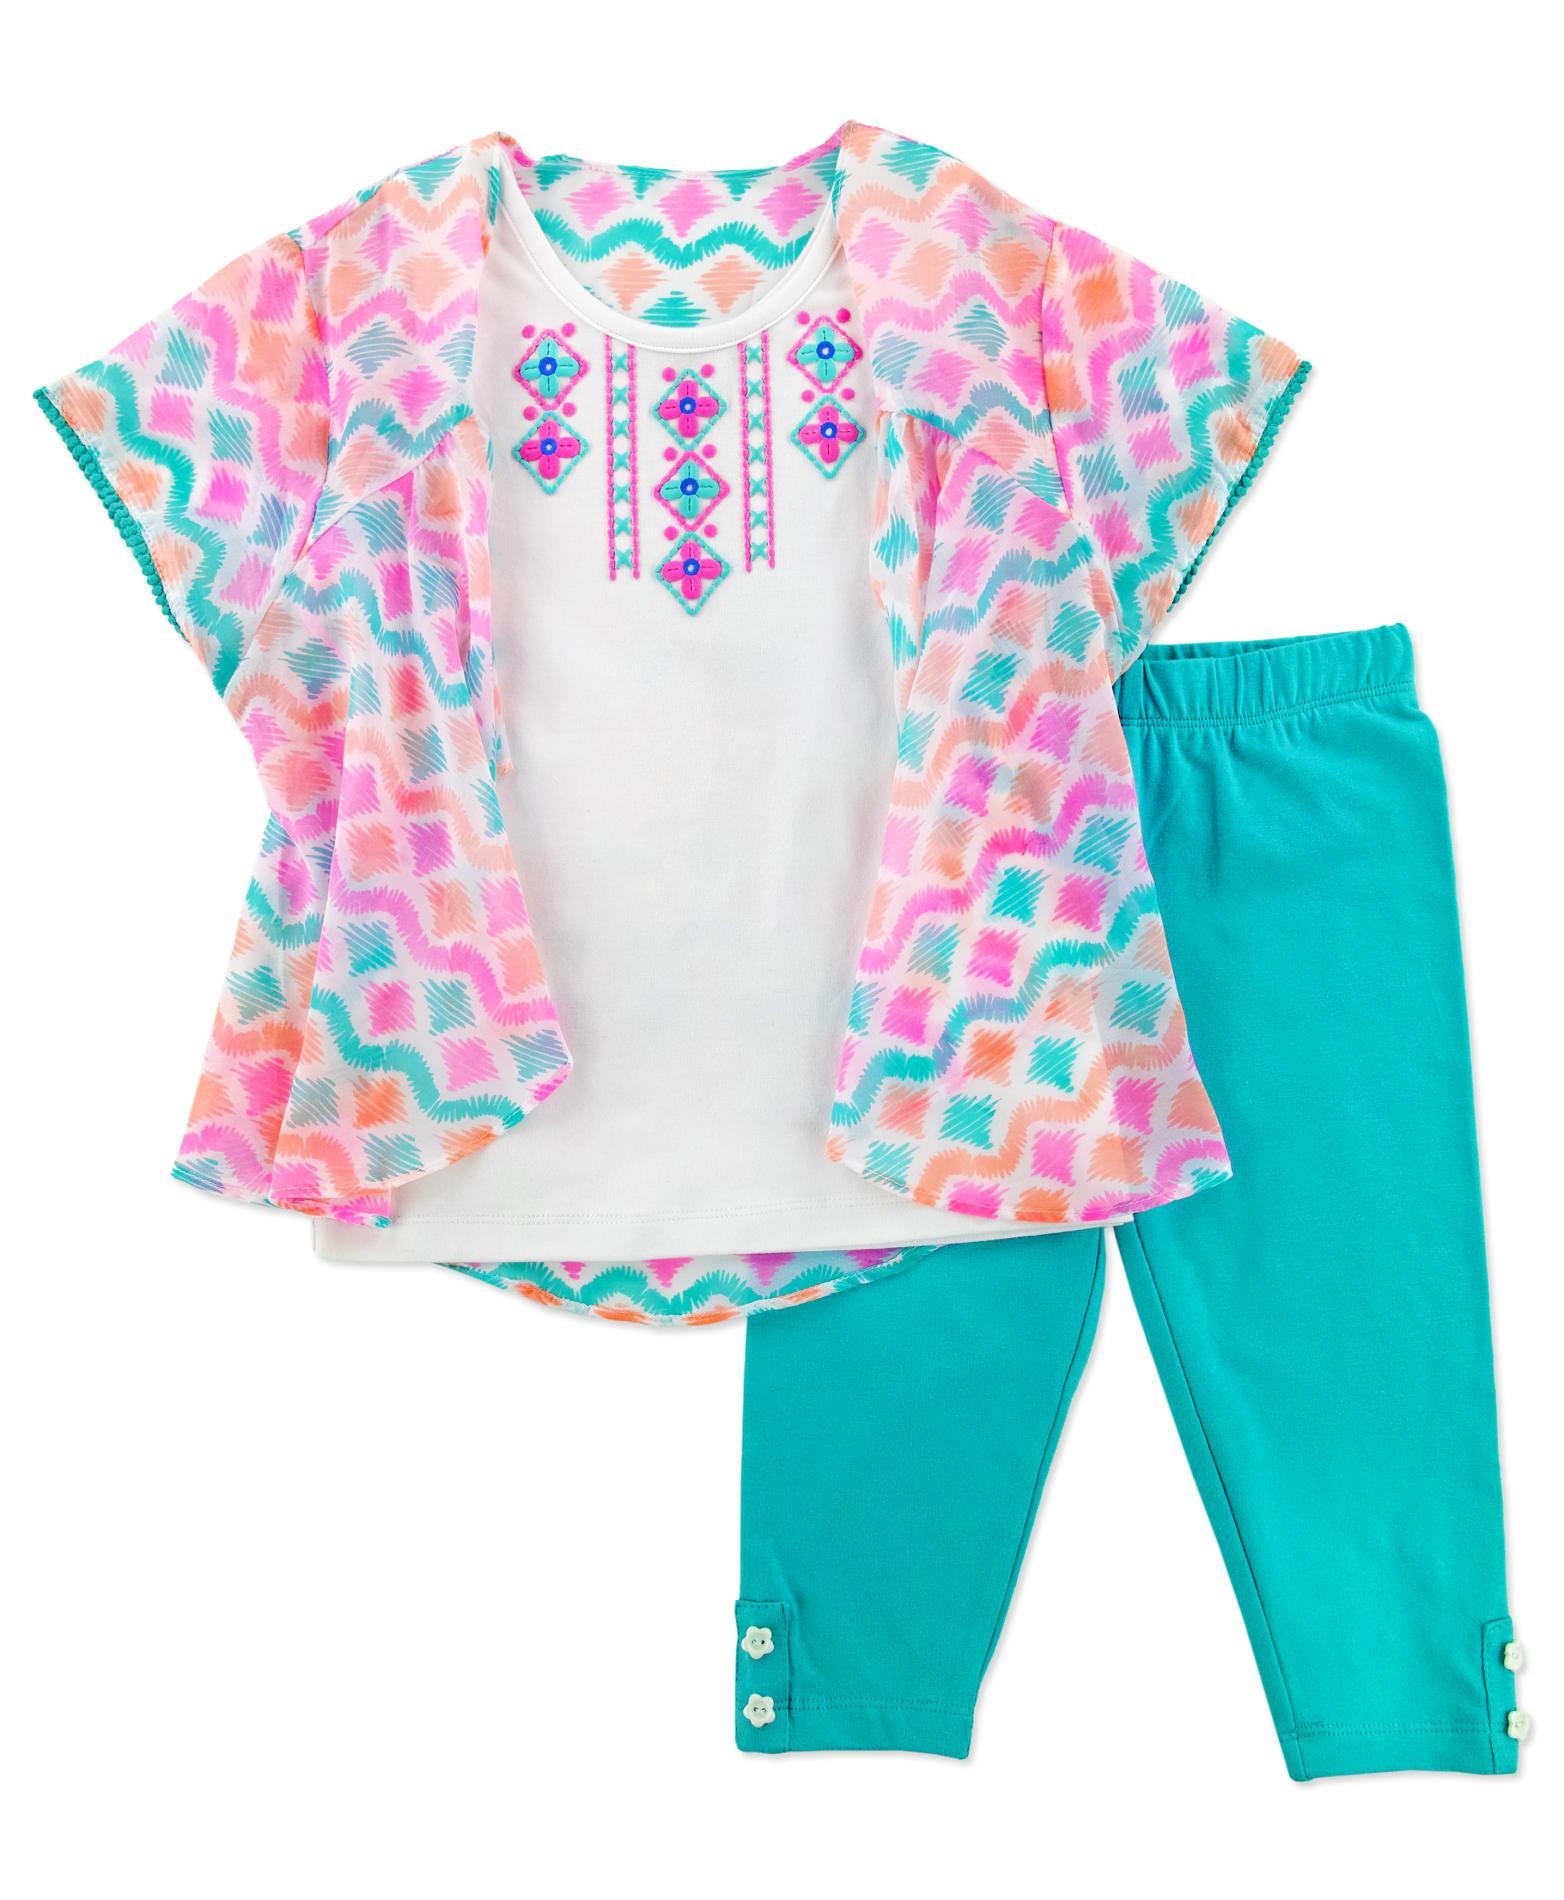 Young Hearts Girl's Layered-Look Top & Leggings - Geometric